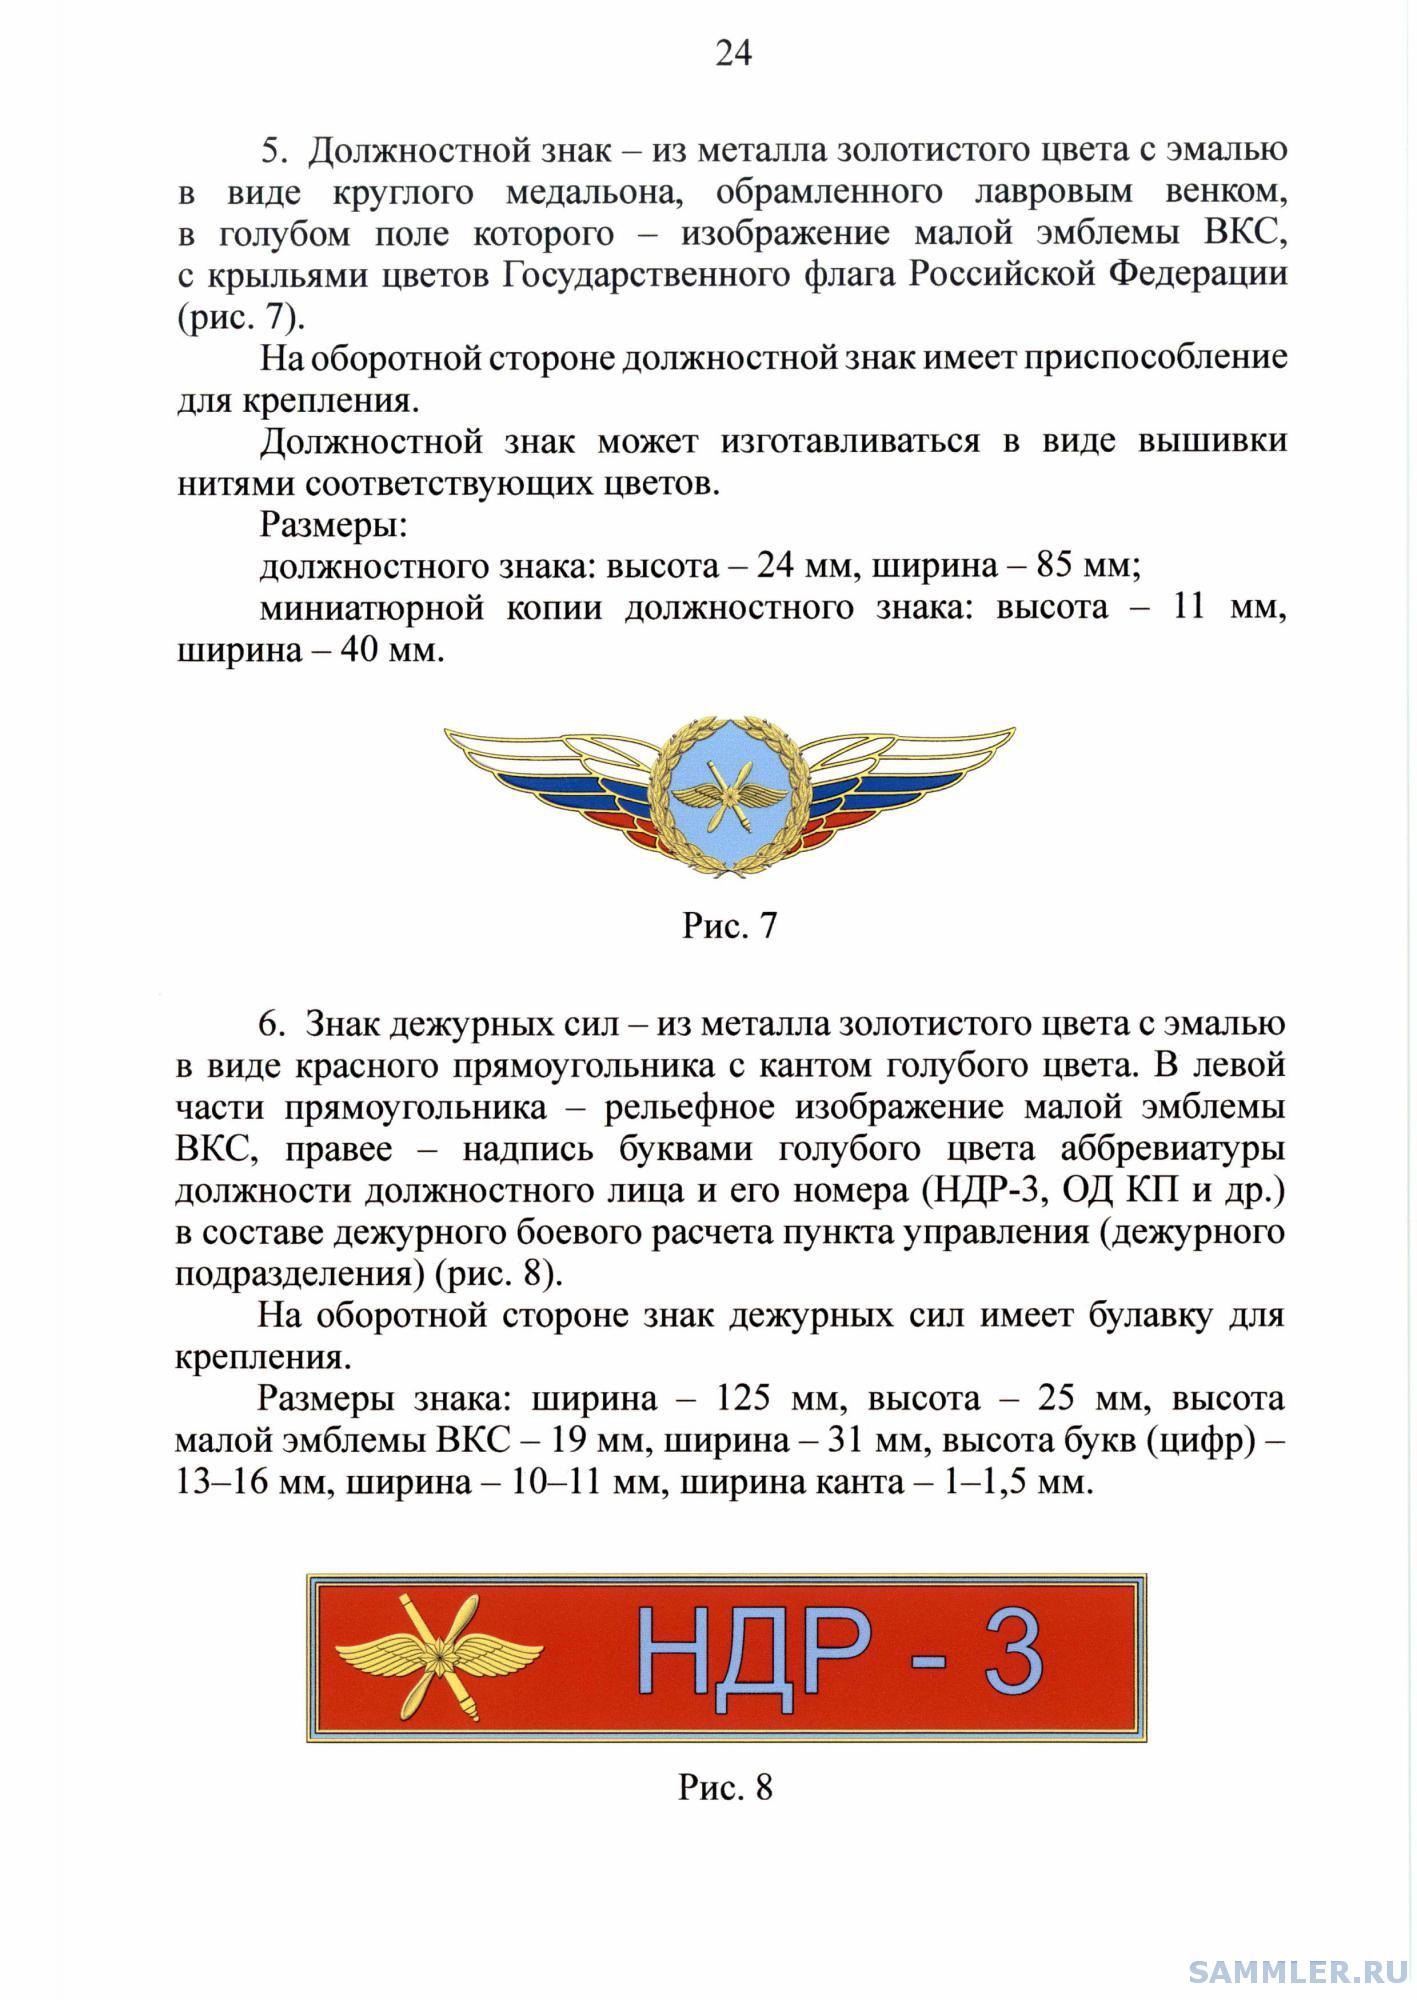 МО РФ 470(цвет)-24.jpg